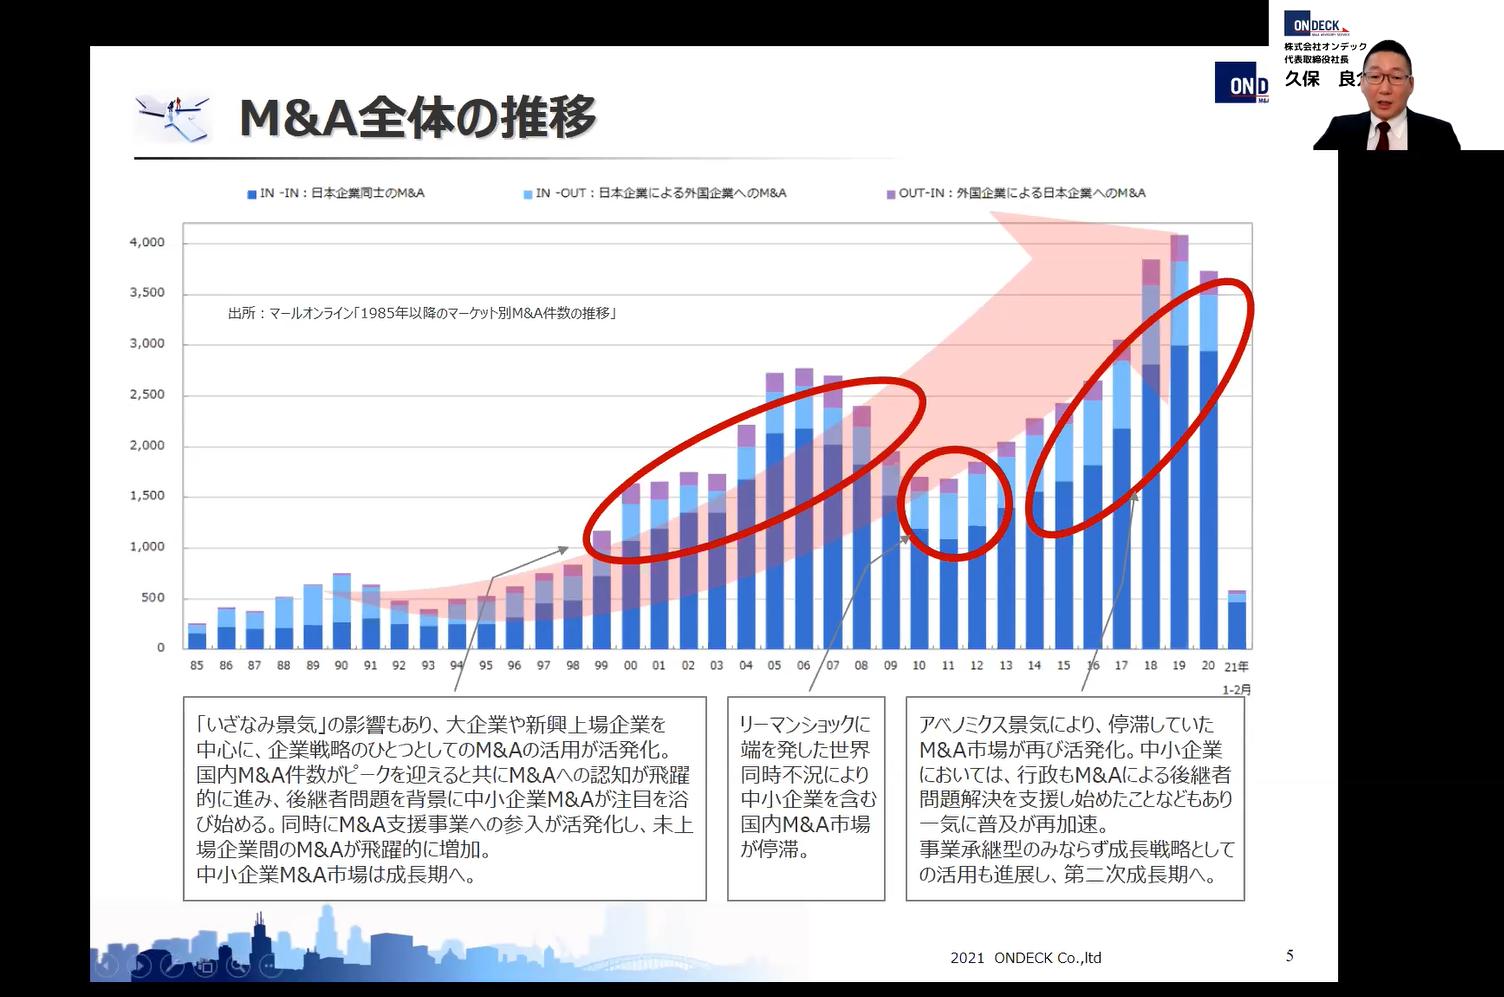 M&A全体の推移(2021/3/23開催セミナー資料より抜粋)